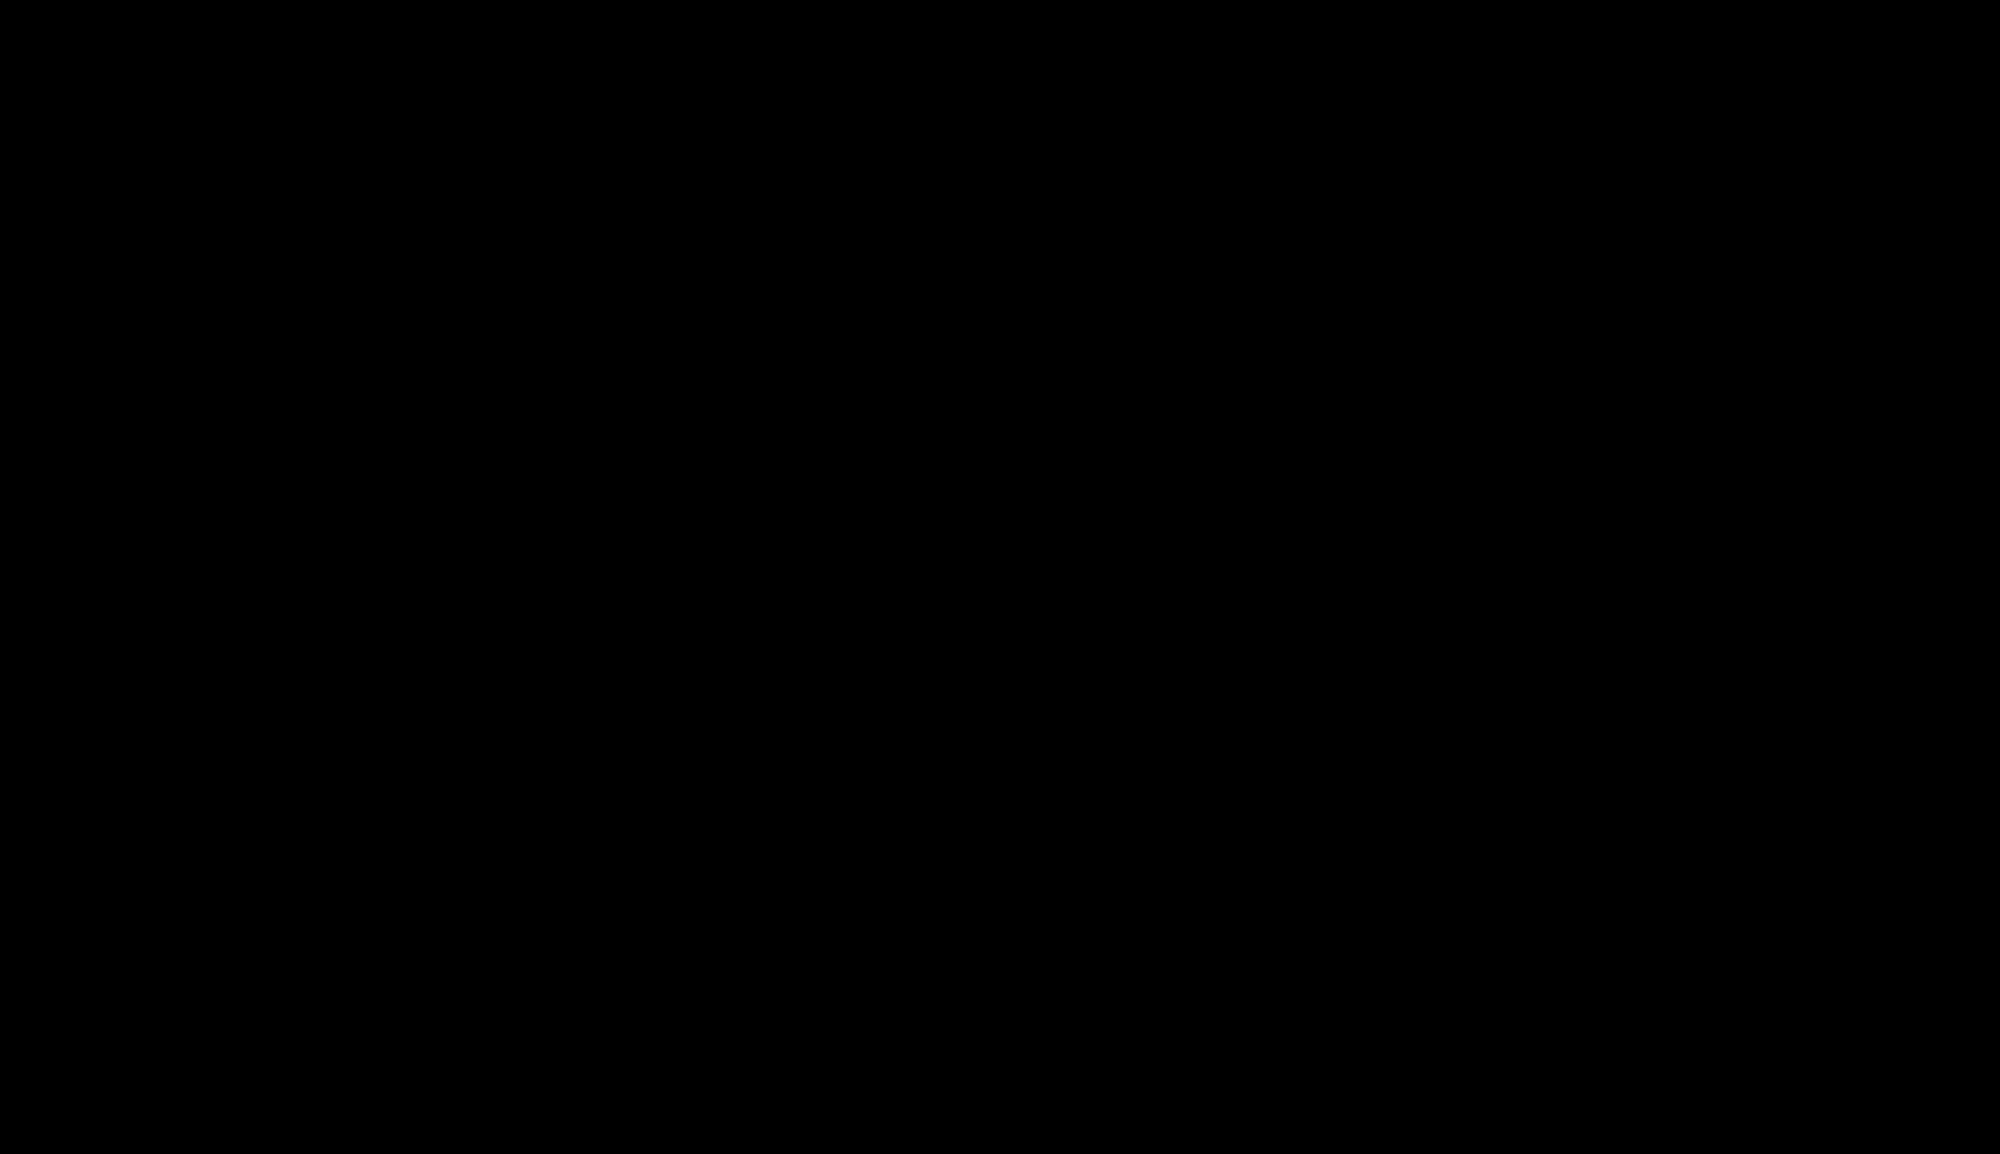 pie chart black.png